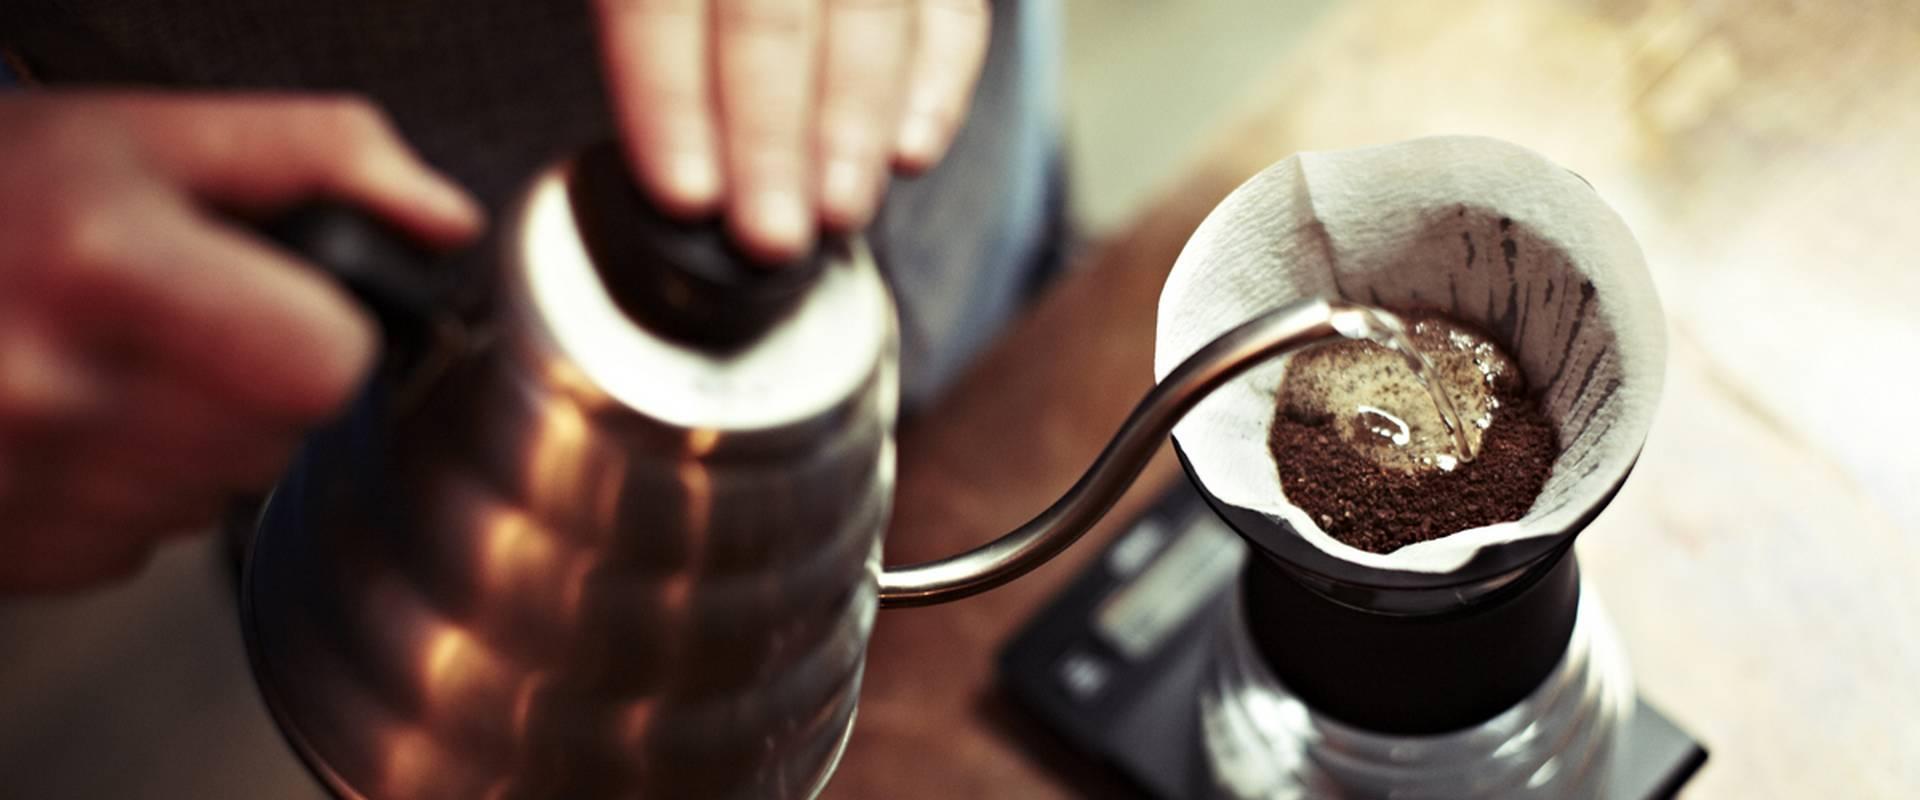 Brewing coffee-kavekeszites-barista